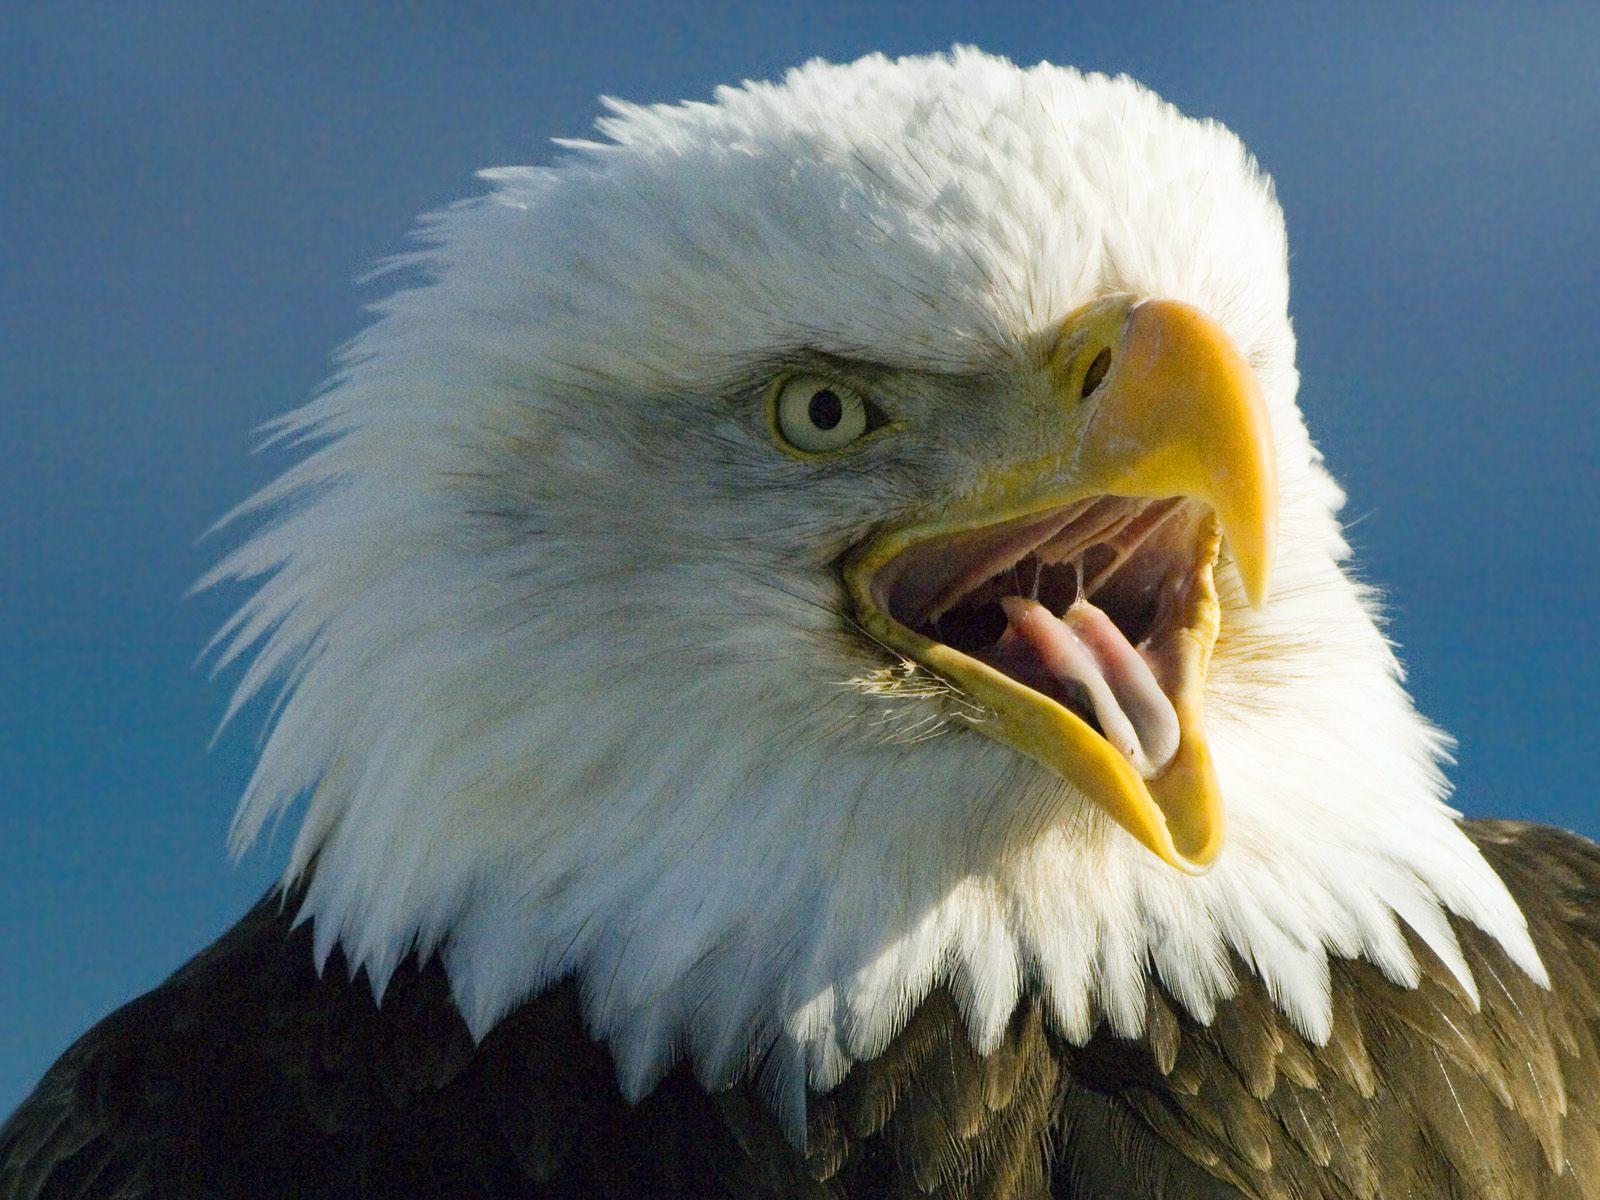 Realistic Bald Eagle life-size & life like replica sculpture